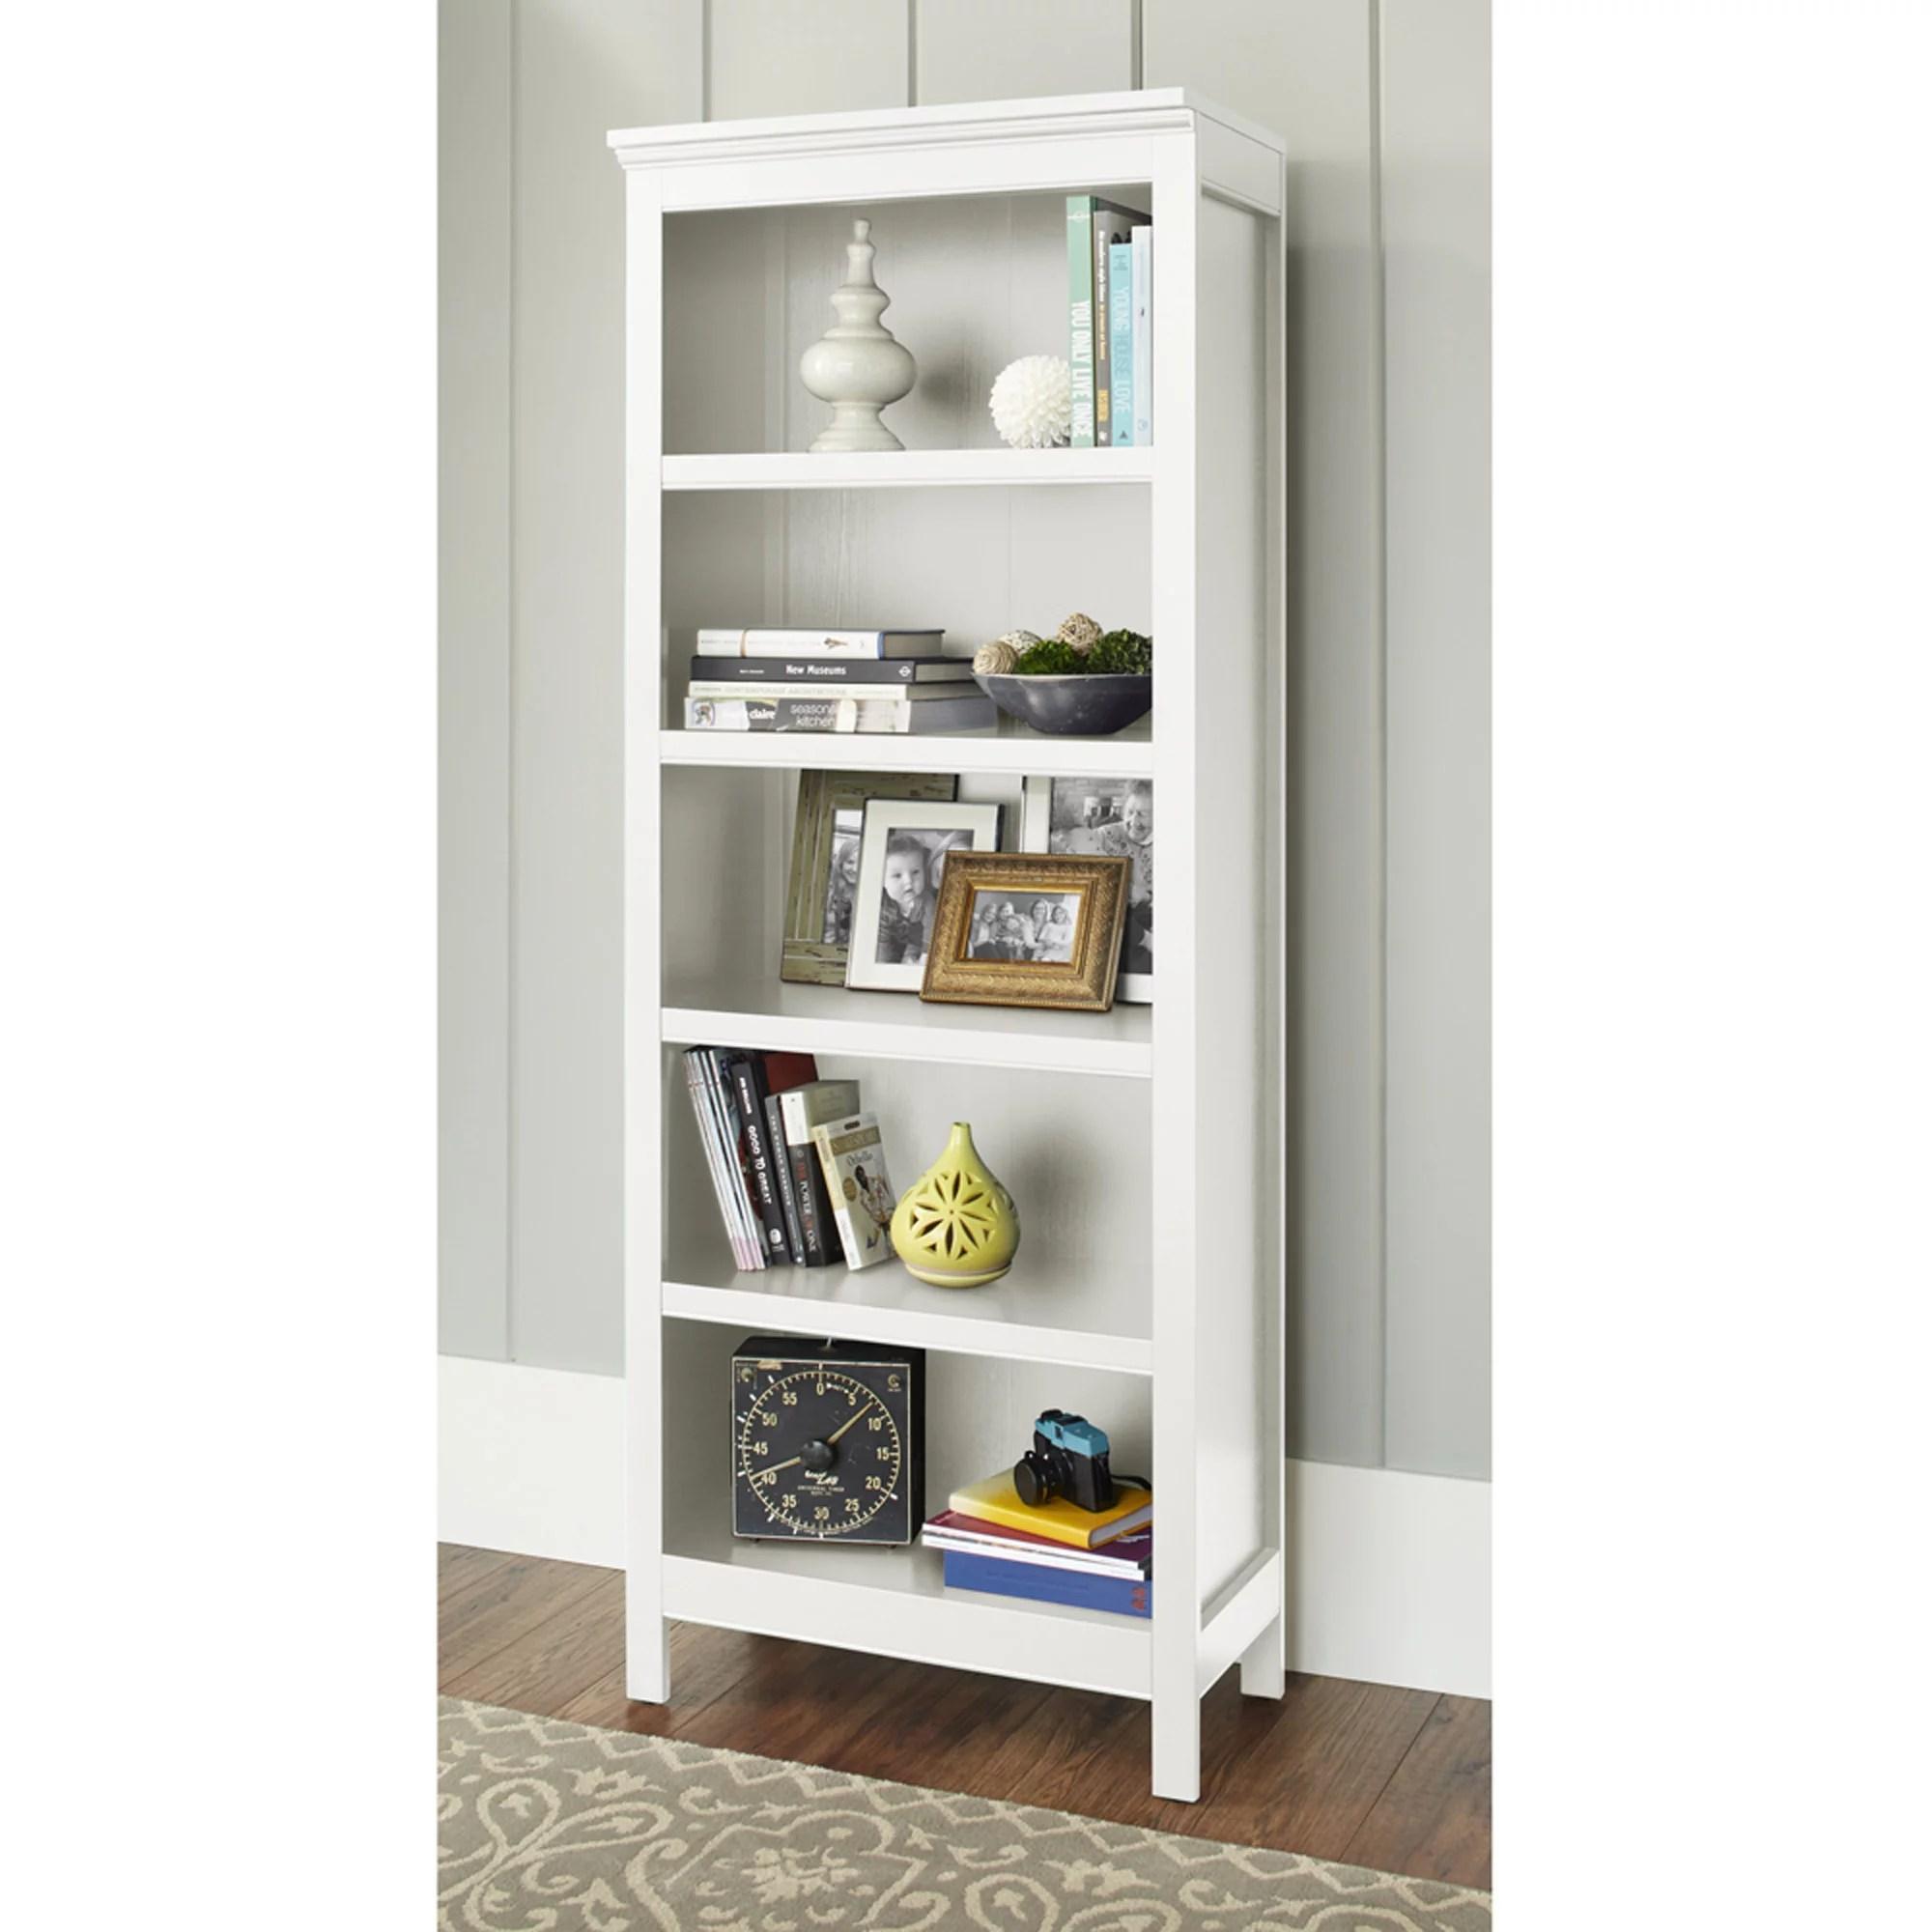 Bookcase 30 Inches Wide